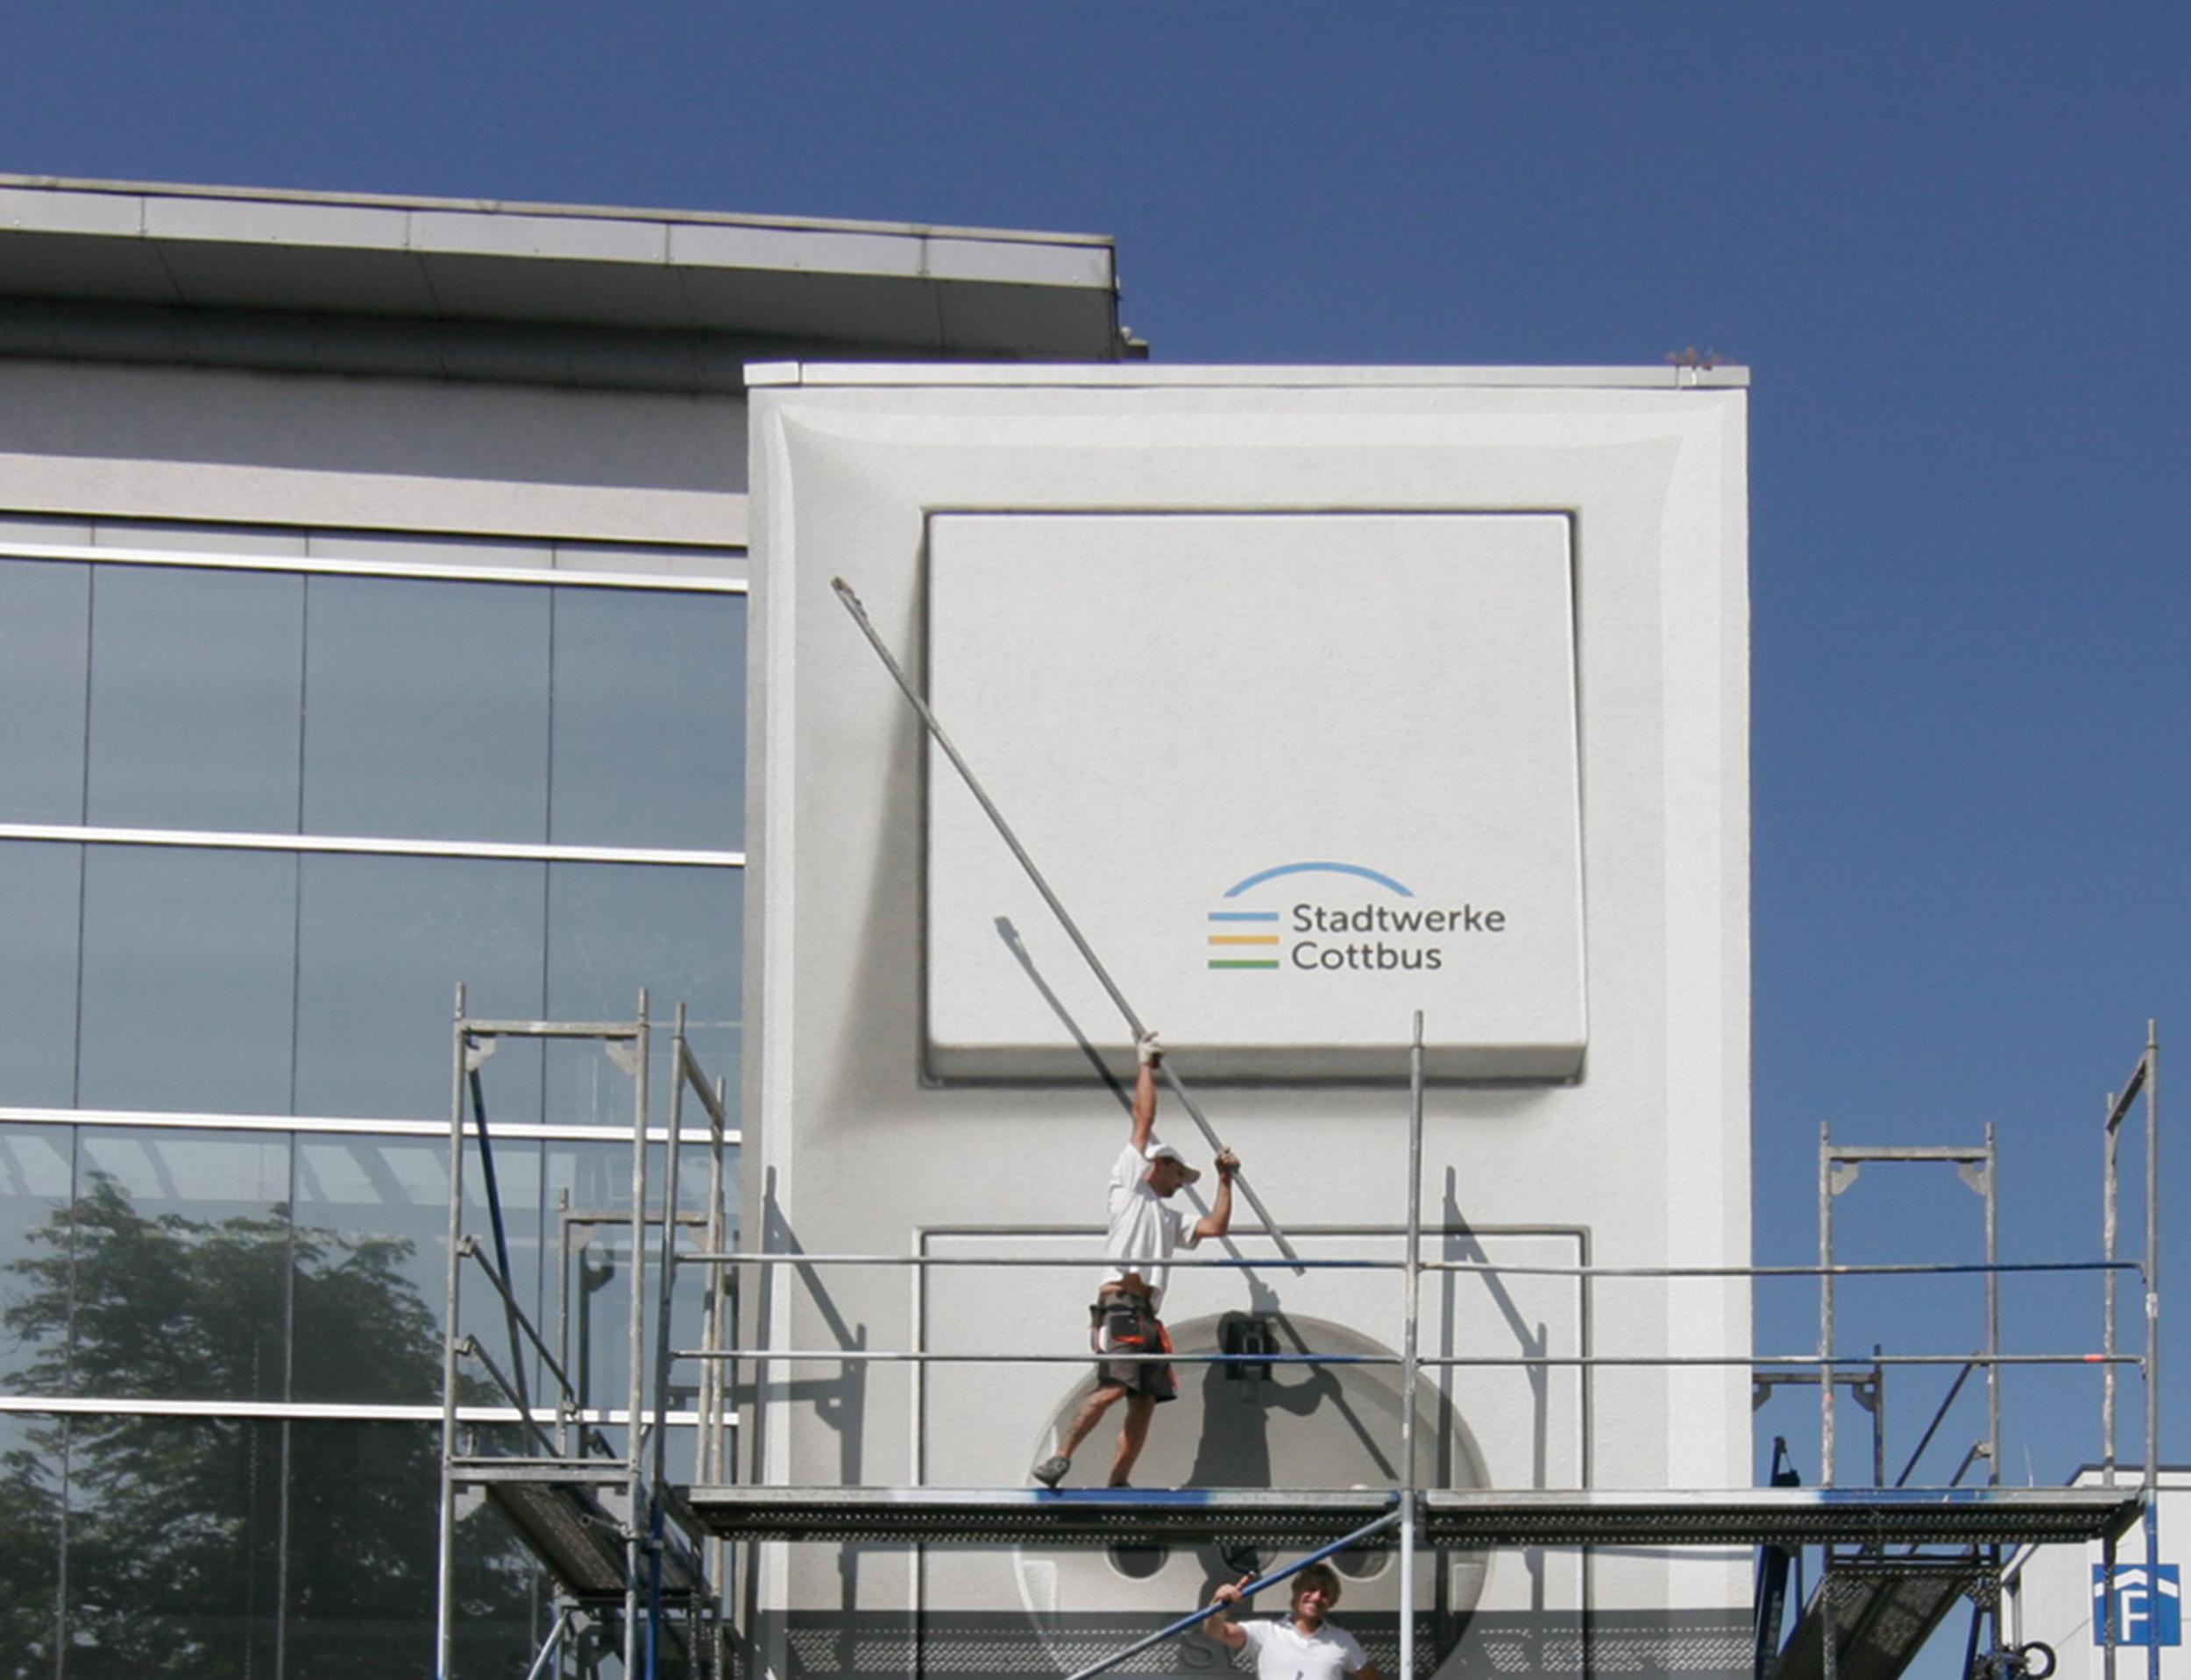 Fassadengestaltung-Industrie-Stadtwerke-Cottbus-Logo-Reklame.jpg